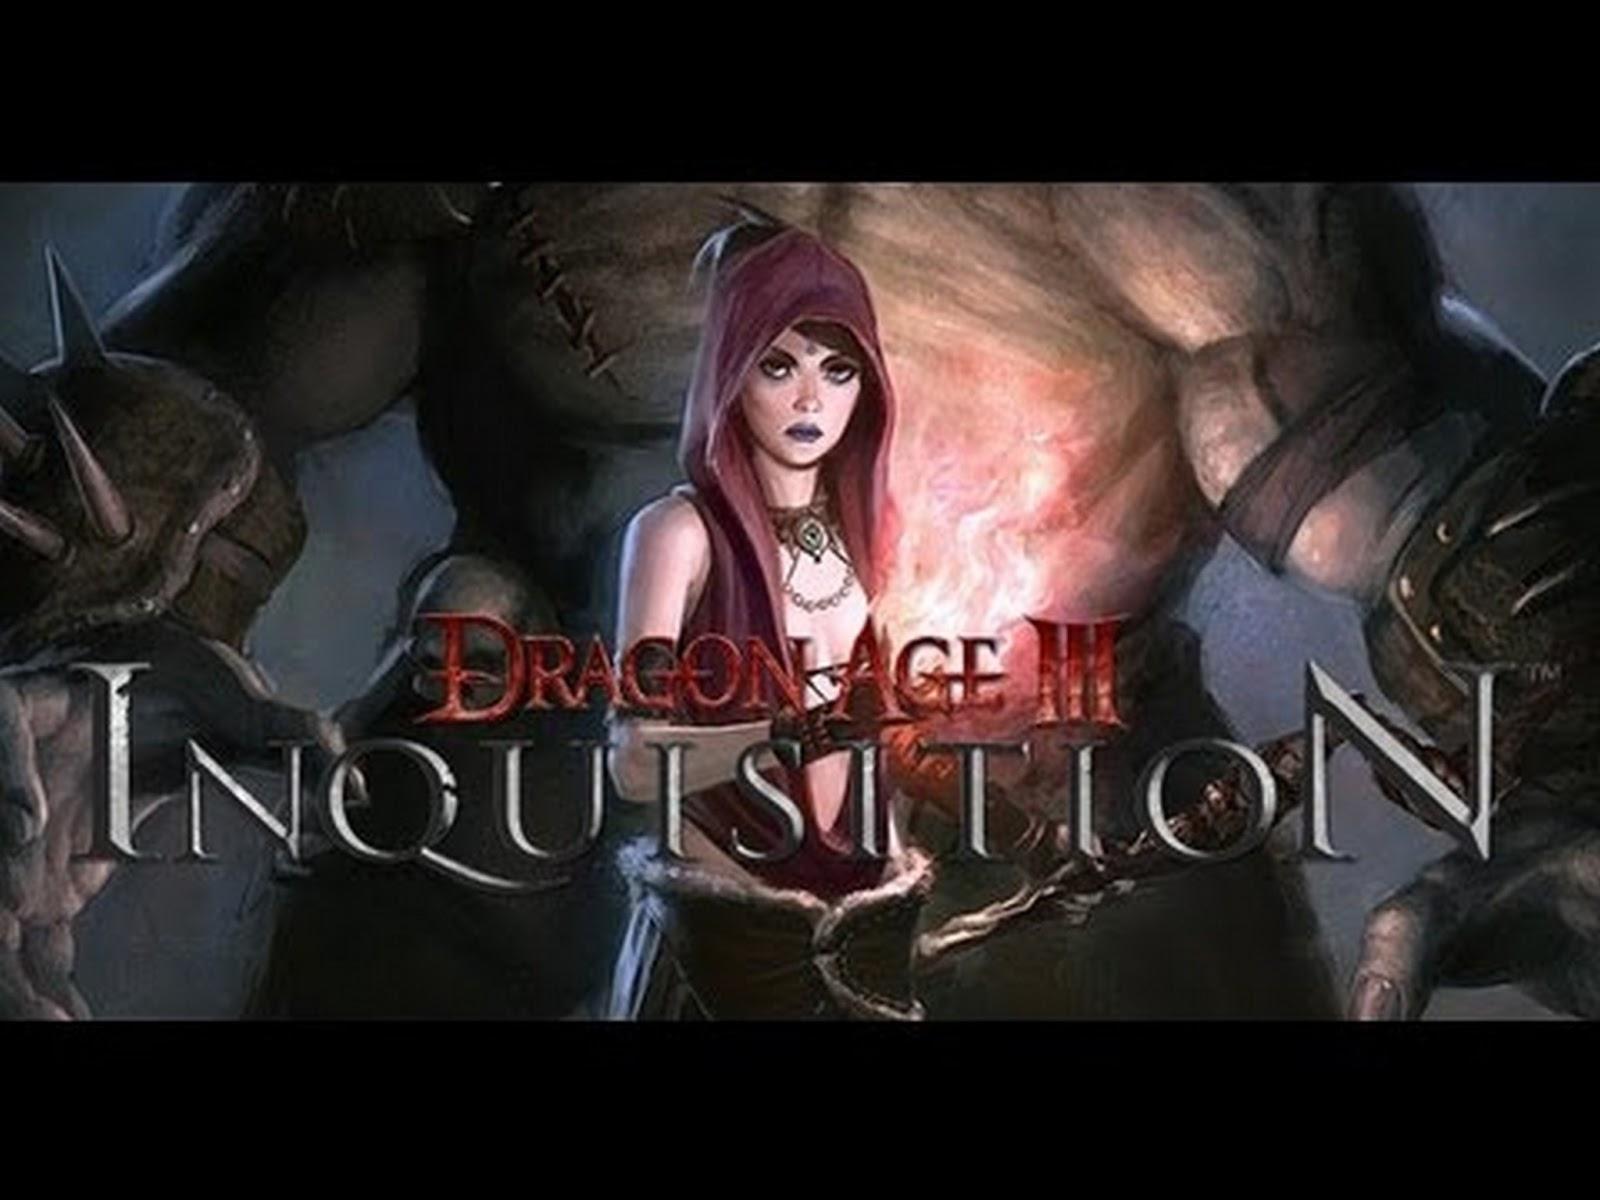 Dragon Age 3. Publisher: EA. Rilis: Akhir 2013